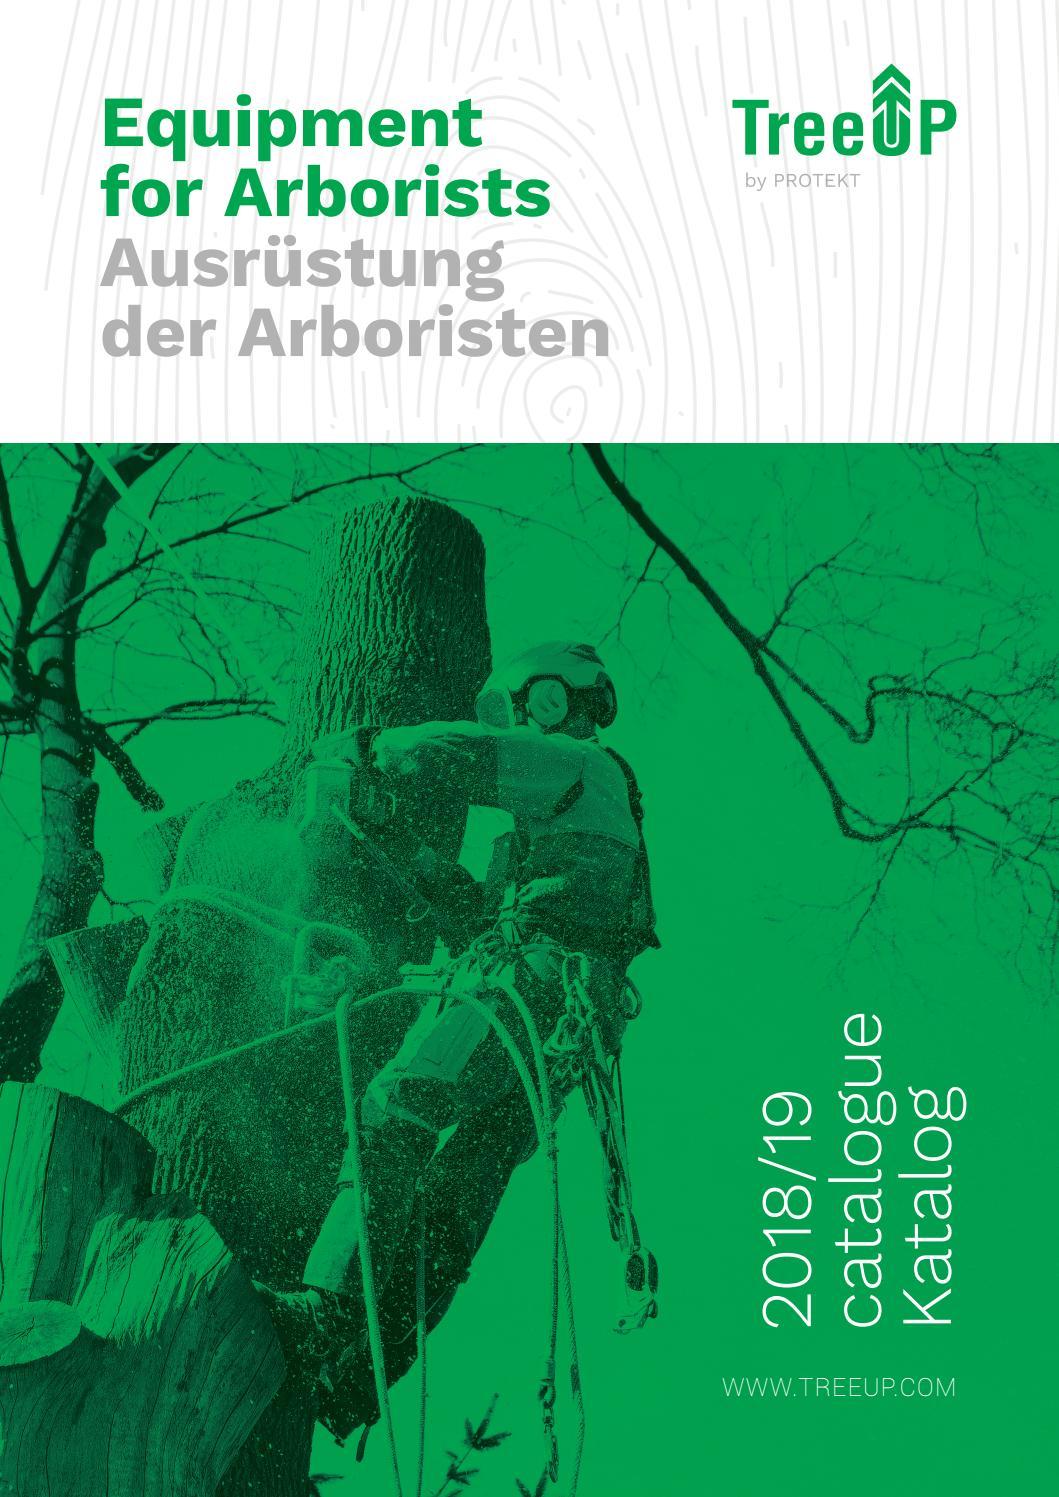 Professional 250//300g Tree Climbing Arborist Rigging Throw Weight Bag Gear Equip